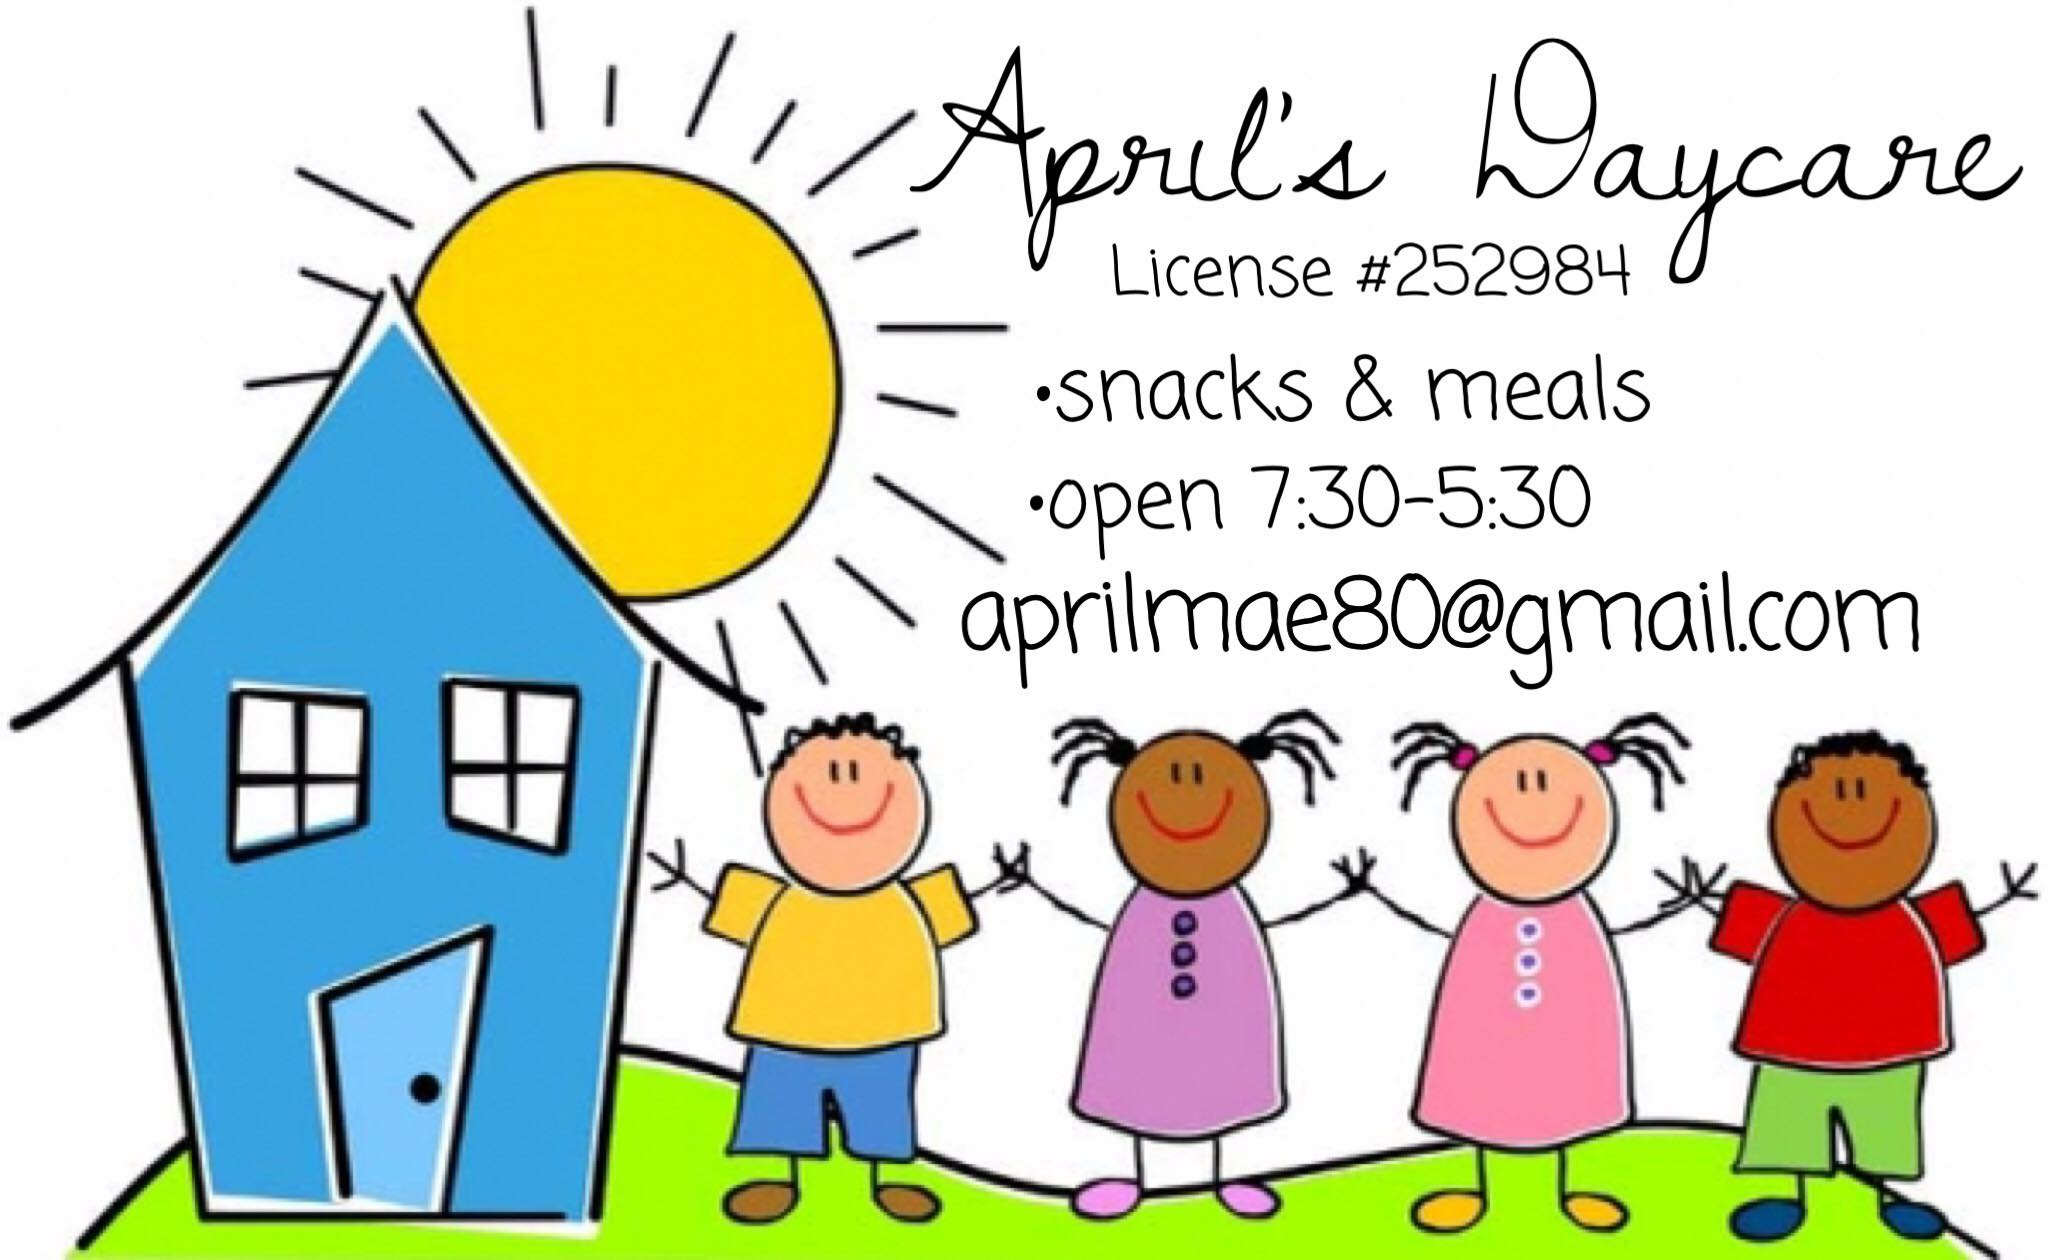 April's Daycare